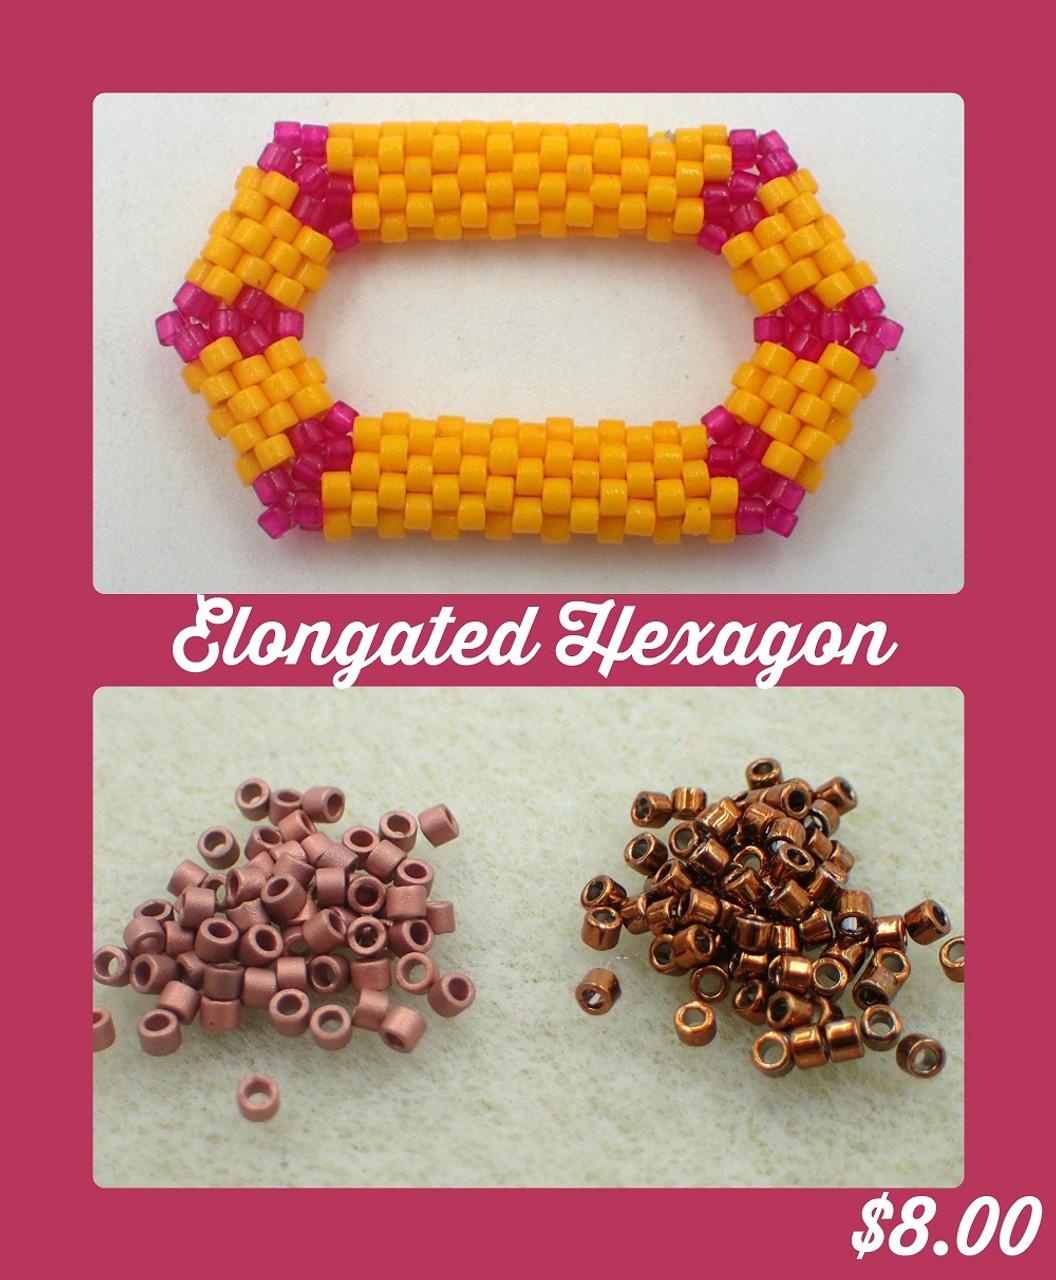 Brown Elongated Hexagon Kit